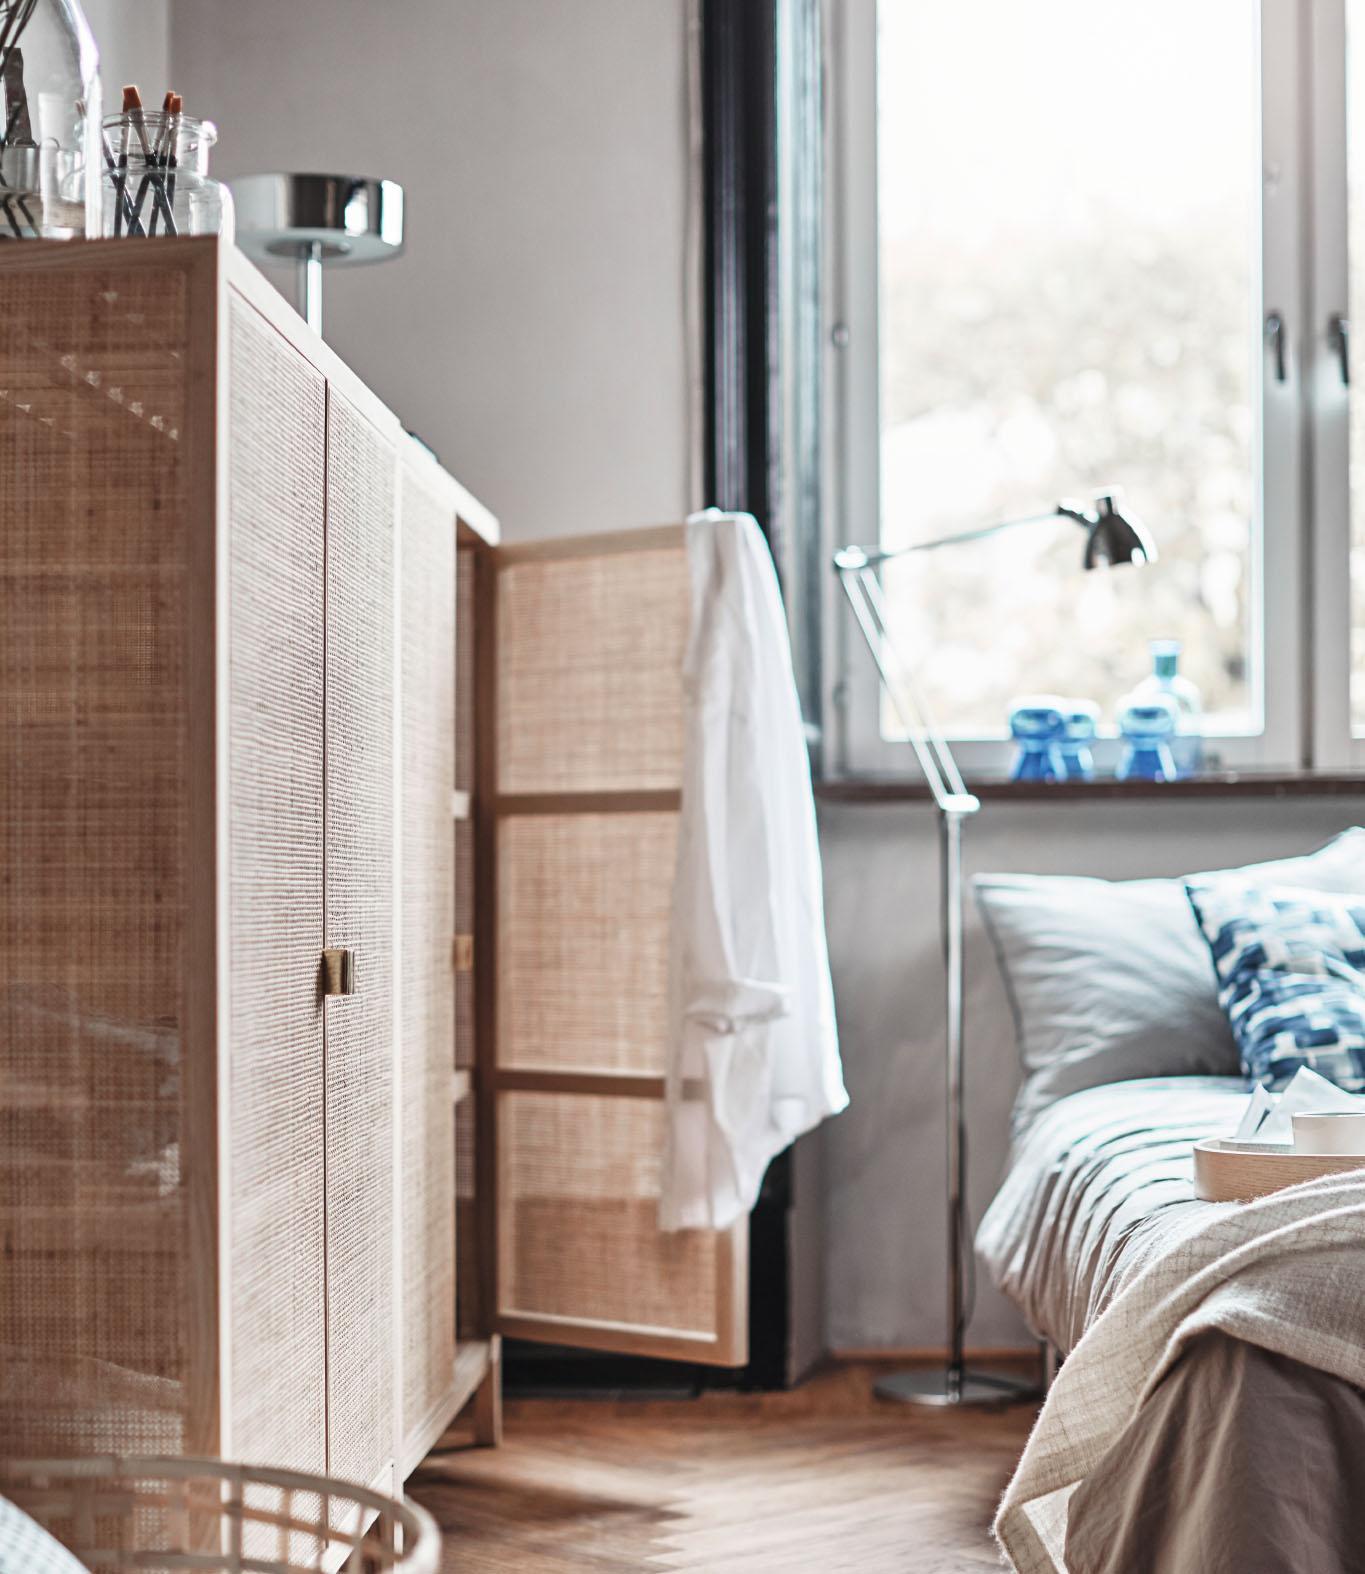 huhtikuussa myyntiin tuleva ikea stockholm mallisto. Black Bedroom Furniture Sets. Home Design Ideas